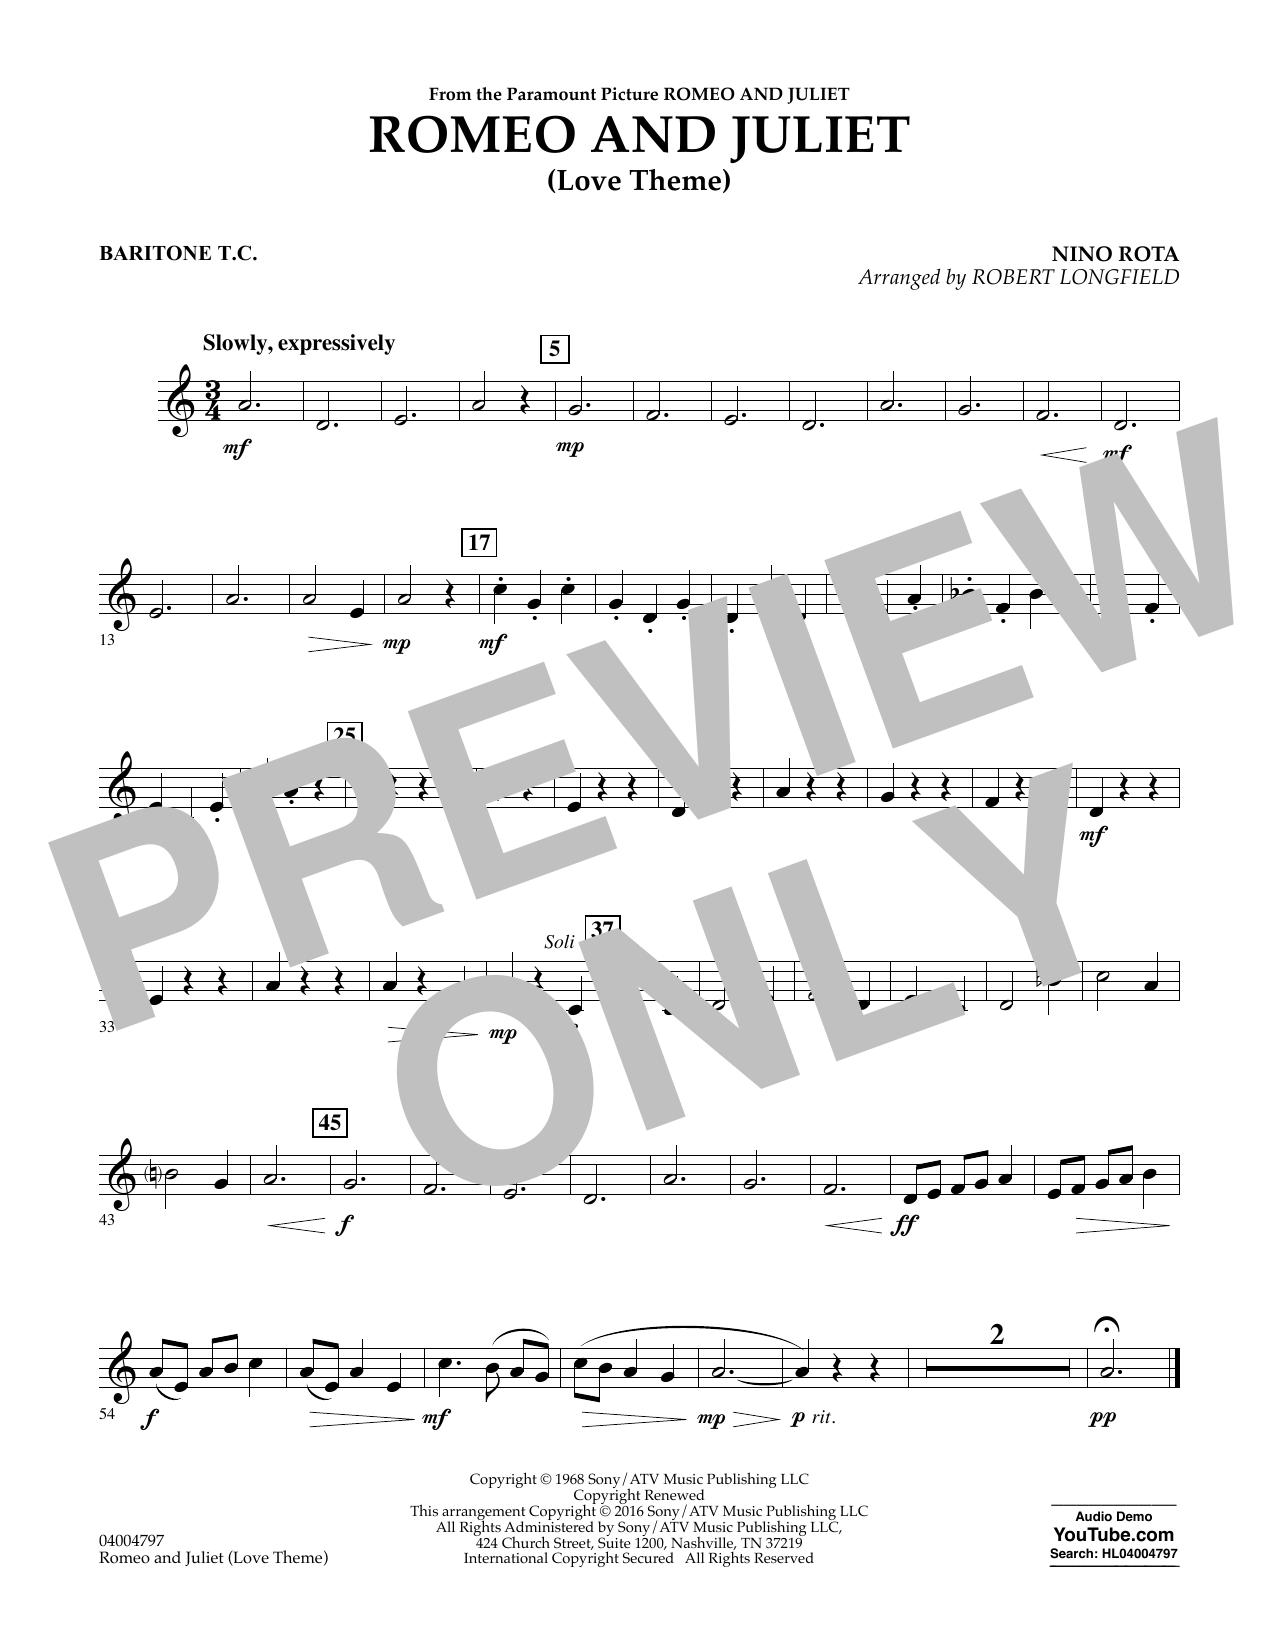 Romeo and Juliet (Love Theme) - Baritone T.C. (Concert Band)